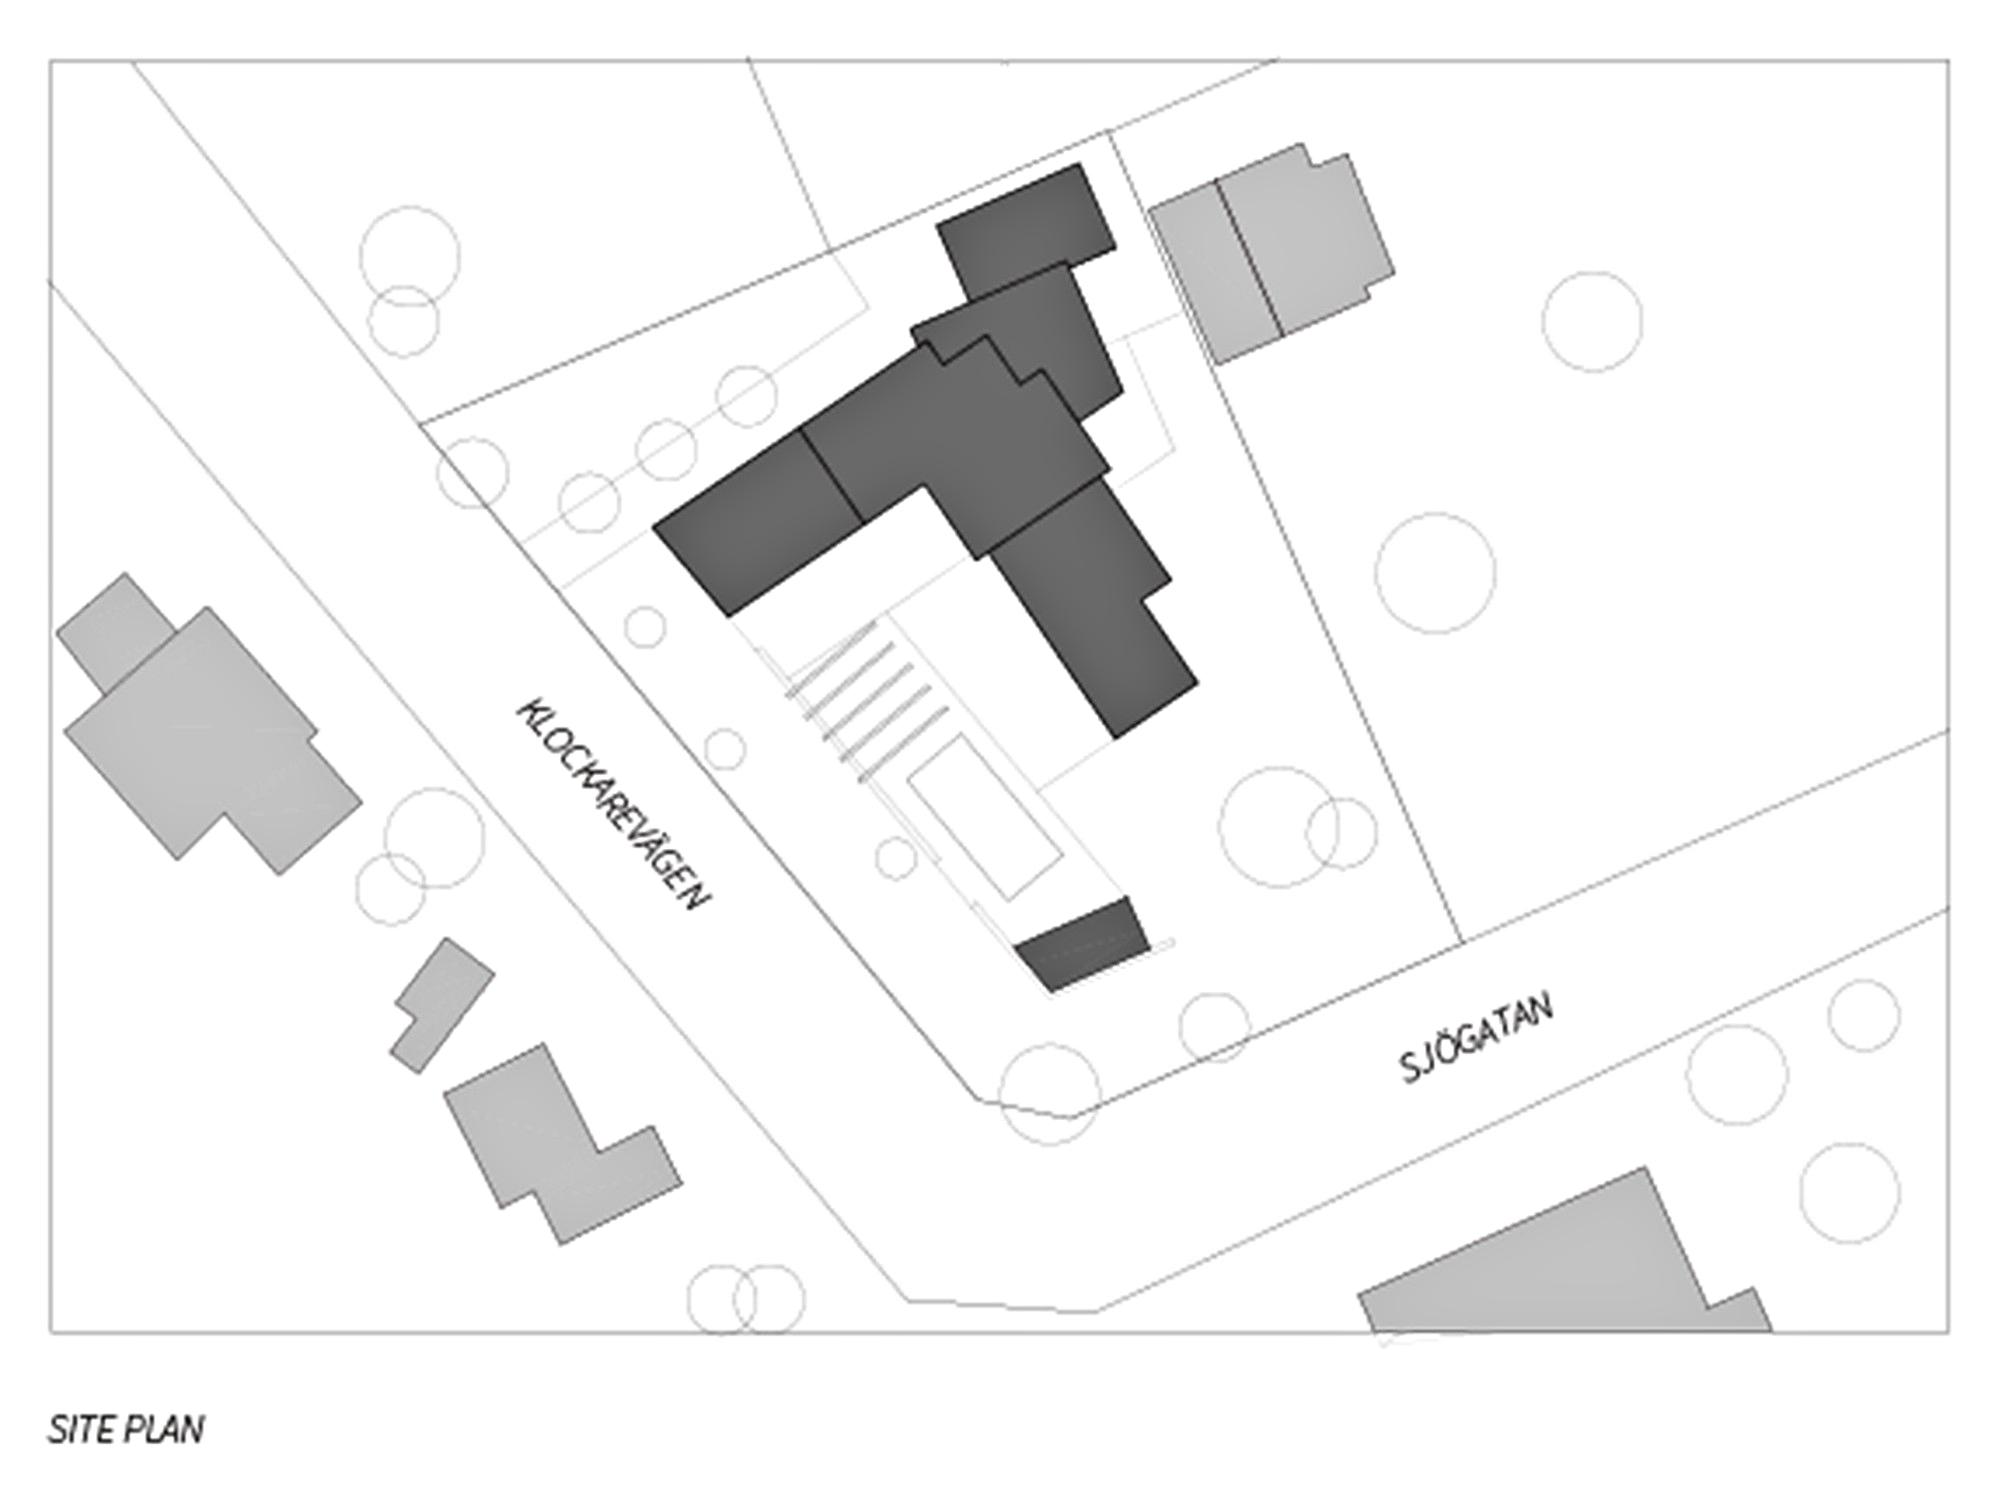 Site Plan - Villa J Residence - Sjovagen 7, Höllviken, Skåne, Sweden